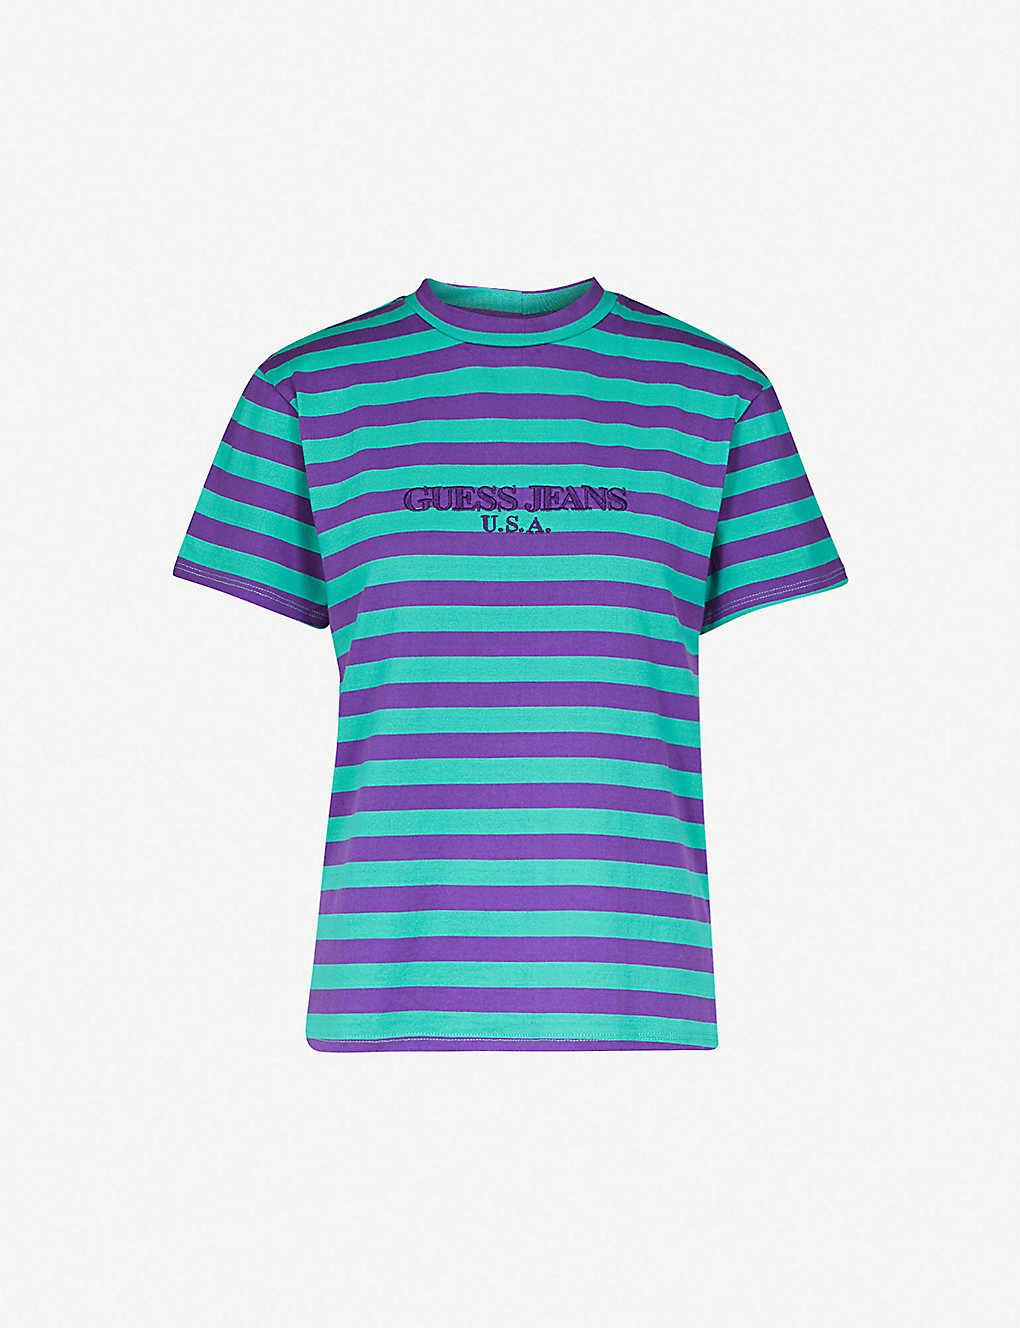 aa017035 GUESS JEANS USA - Farmers Market logo-print striped cotton-jersey T ...